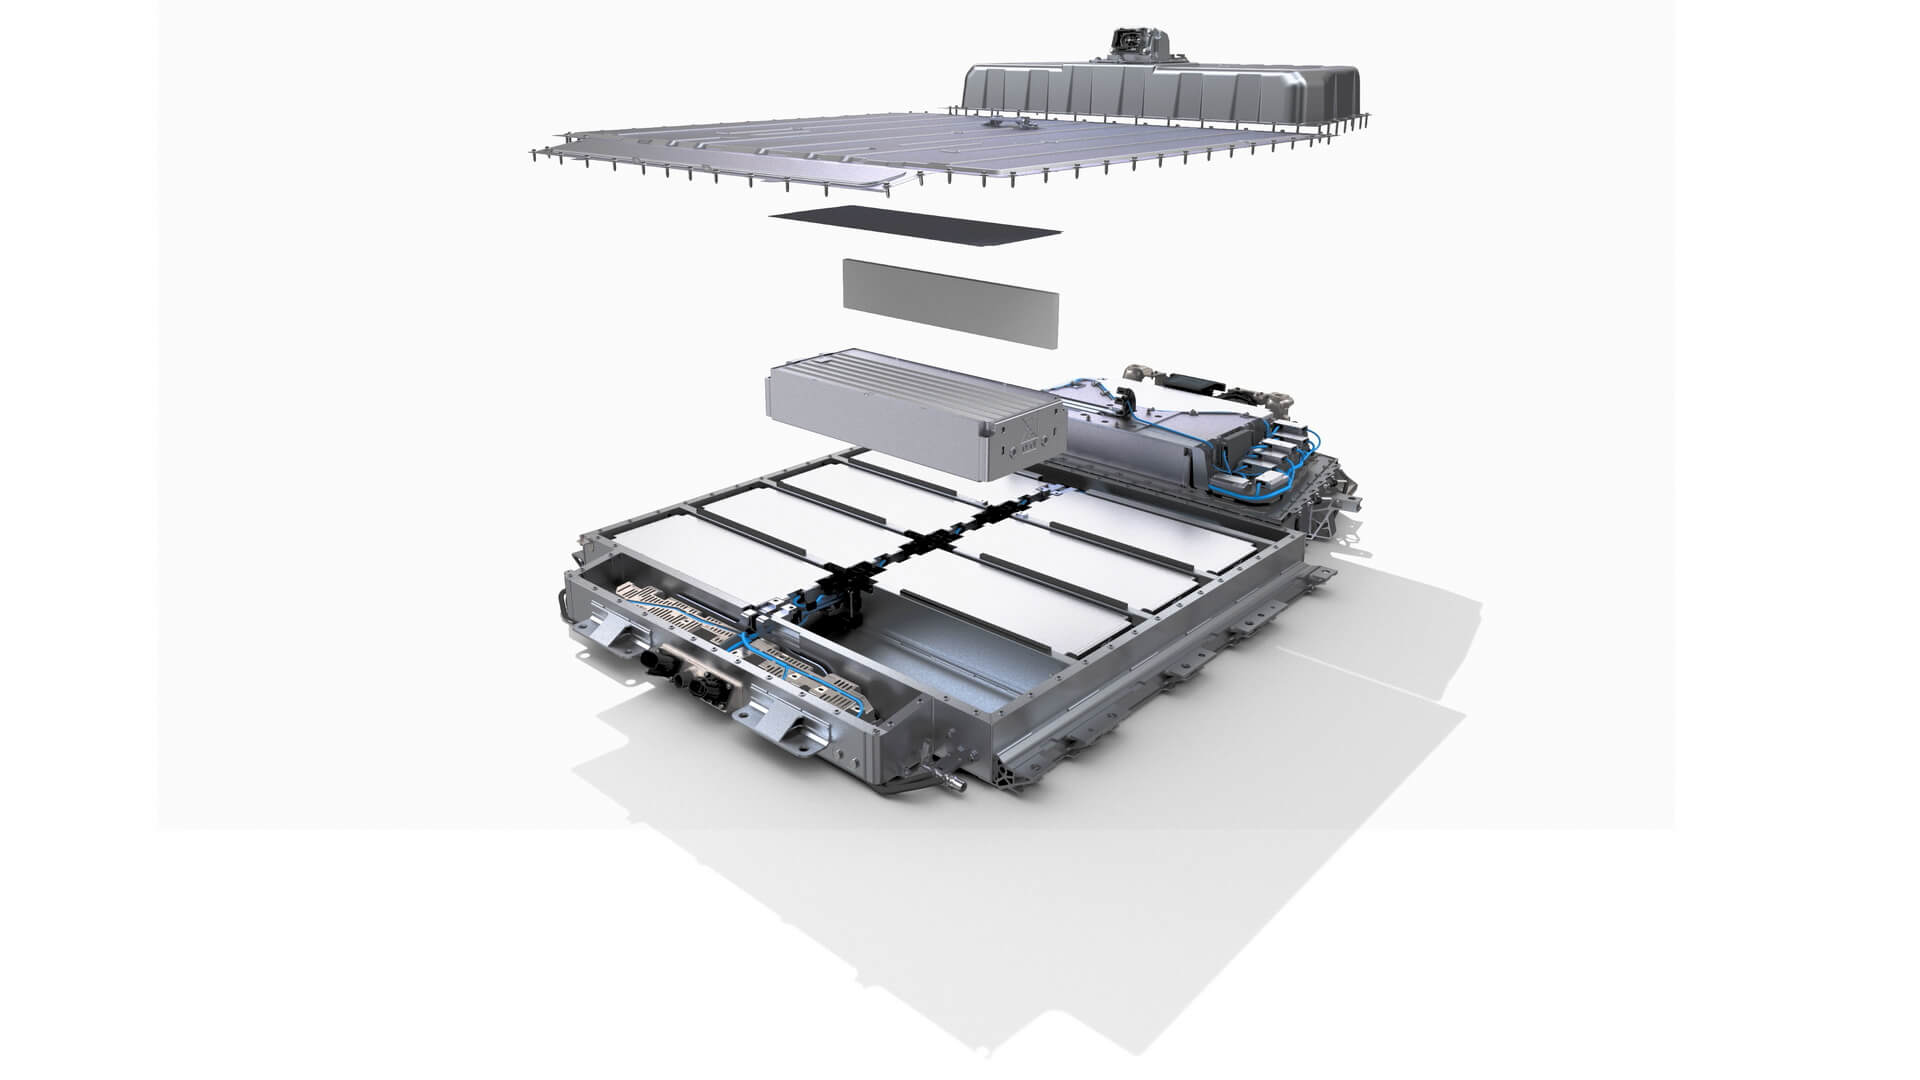 Конуструкция тонкой аккумуляторной батареи Renault Megane E-Tech Electric